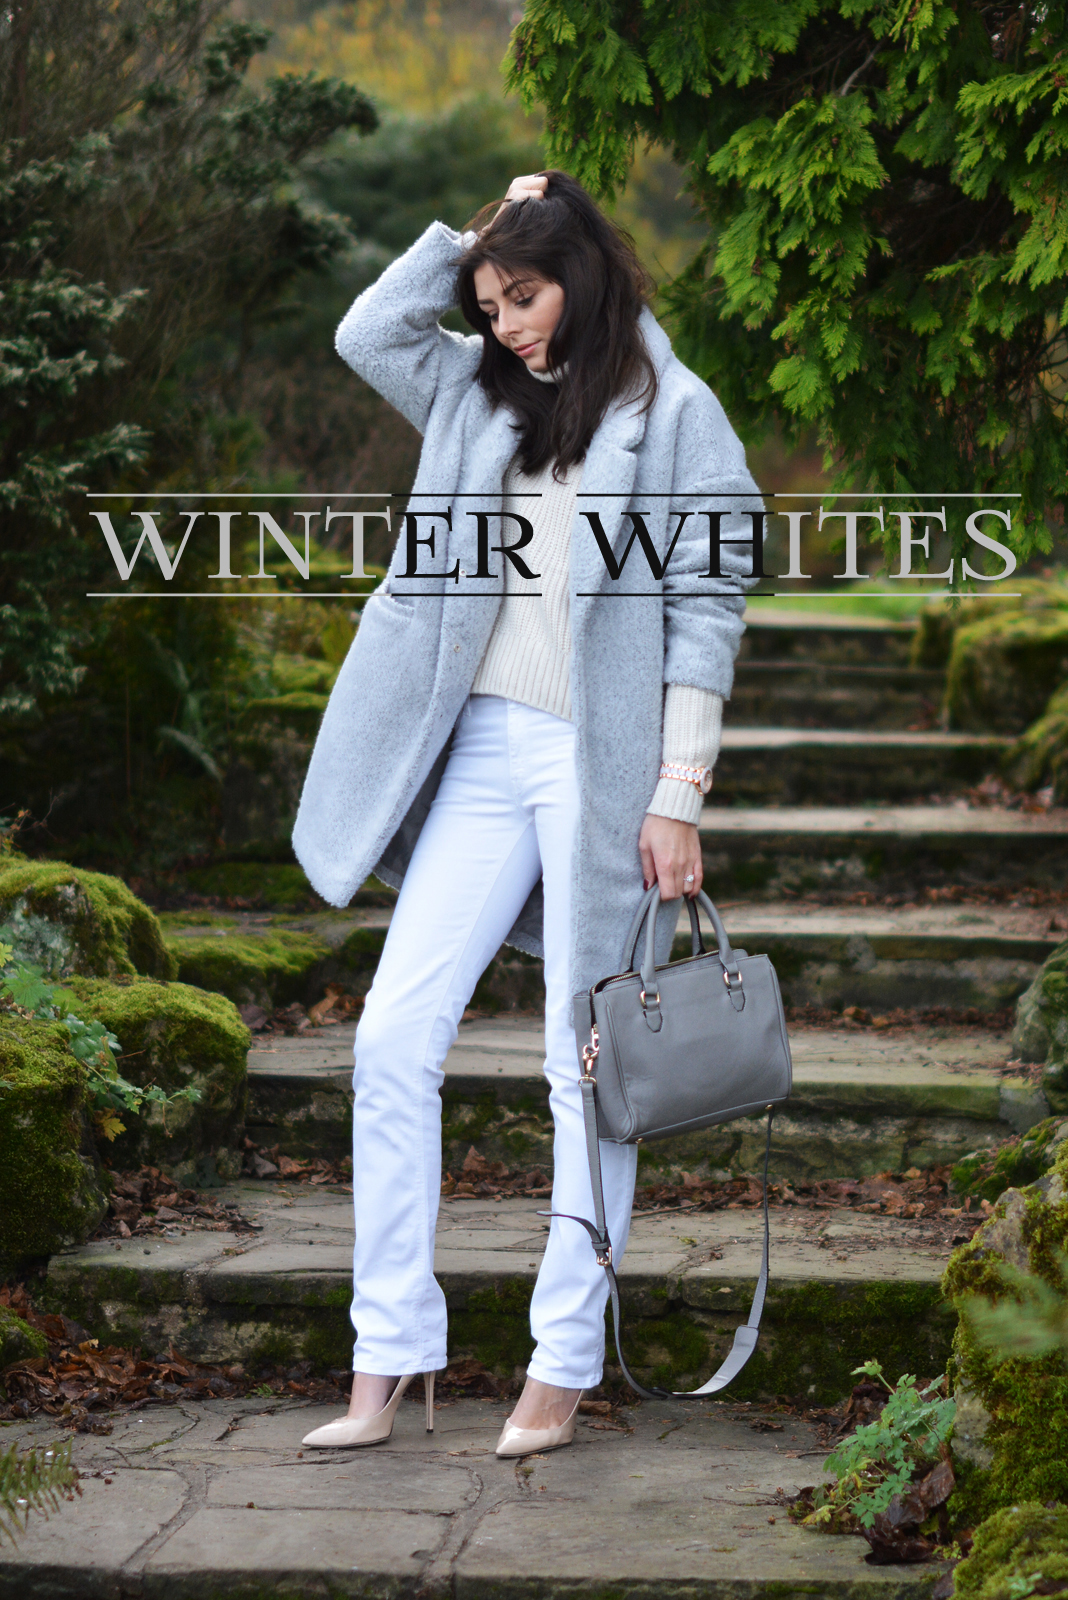 EJSTYLE - winter whites OOTD, white jeans, grey primark coat, Grey Zara city bag, Nude heels, Cream topshop jumper roll neck sweater 2